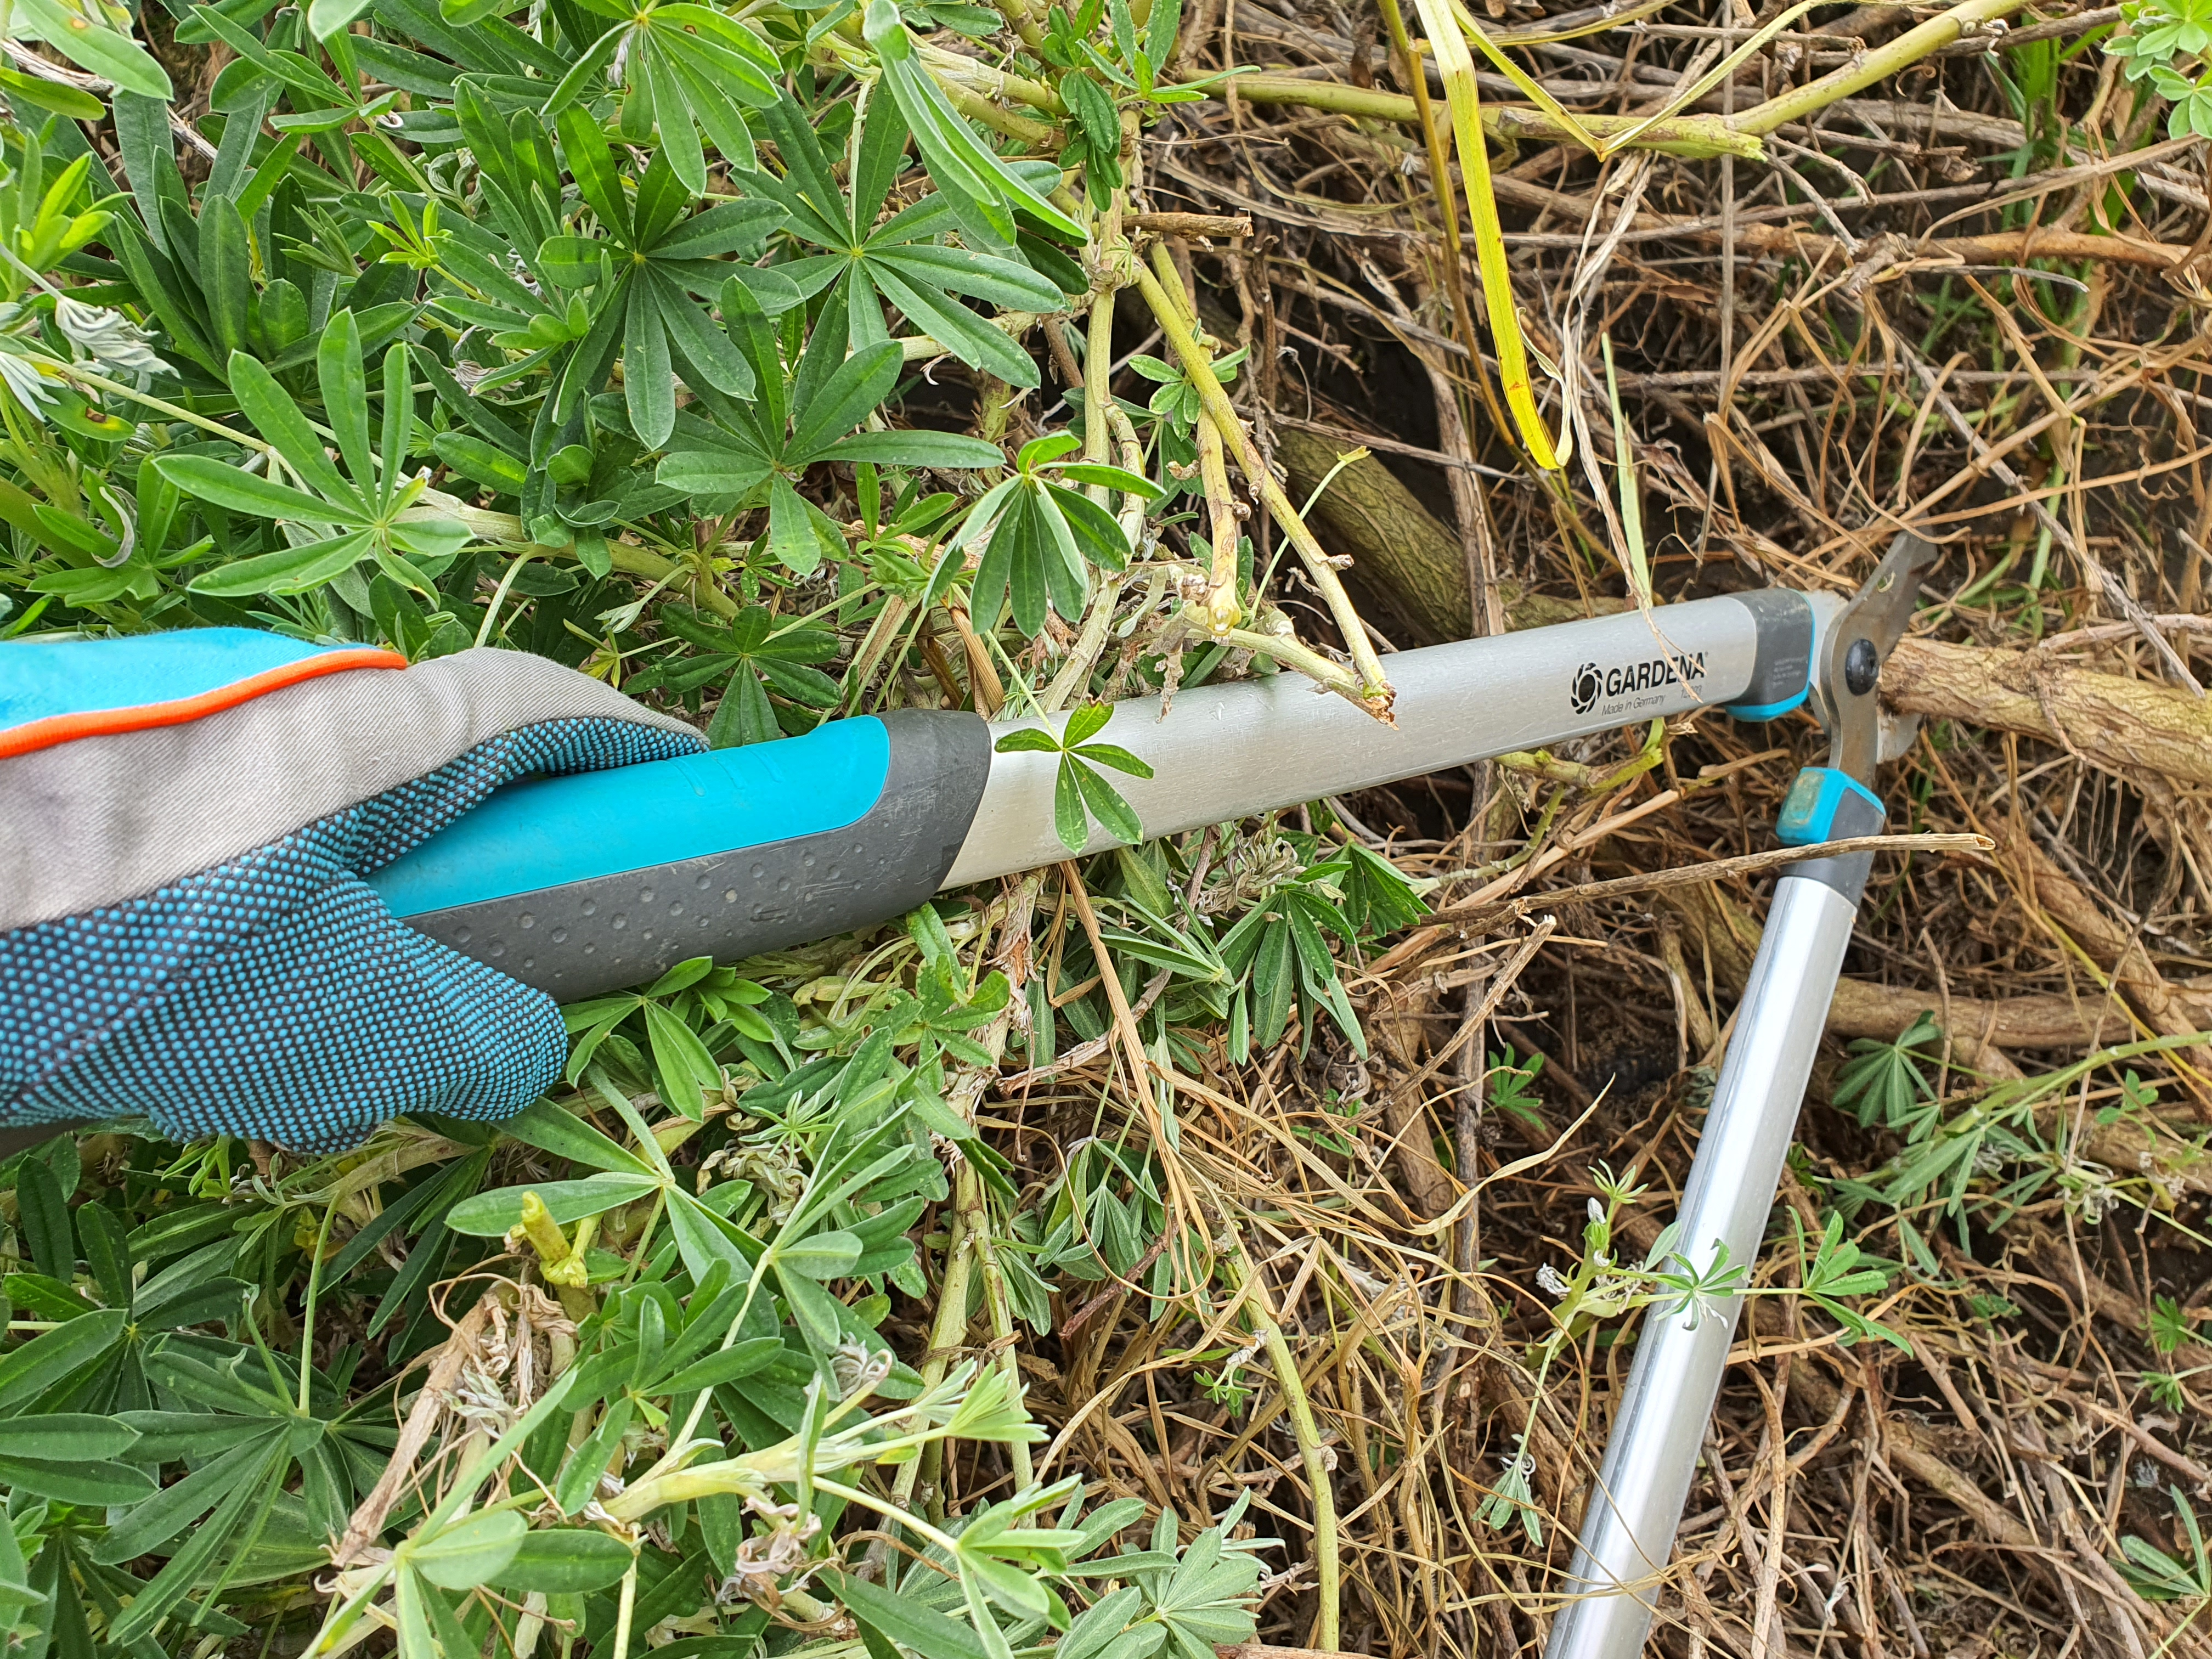 GARDENA Pruning Lopper EasyCut 680 B